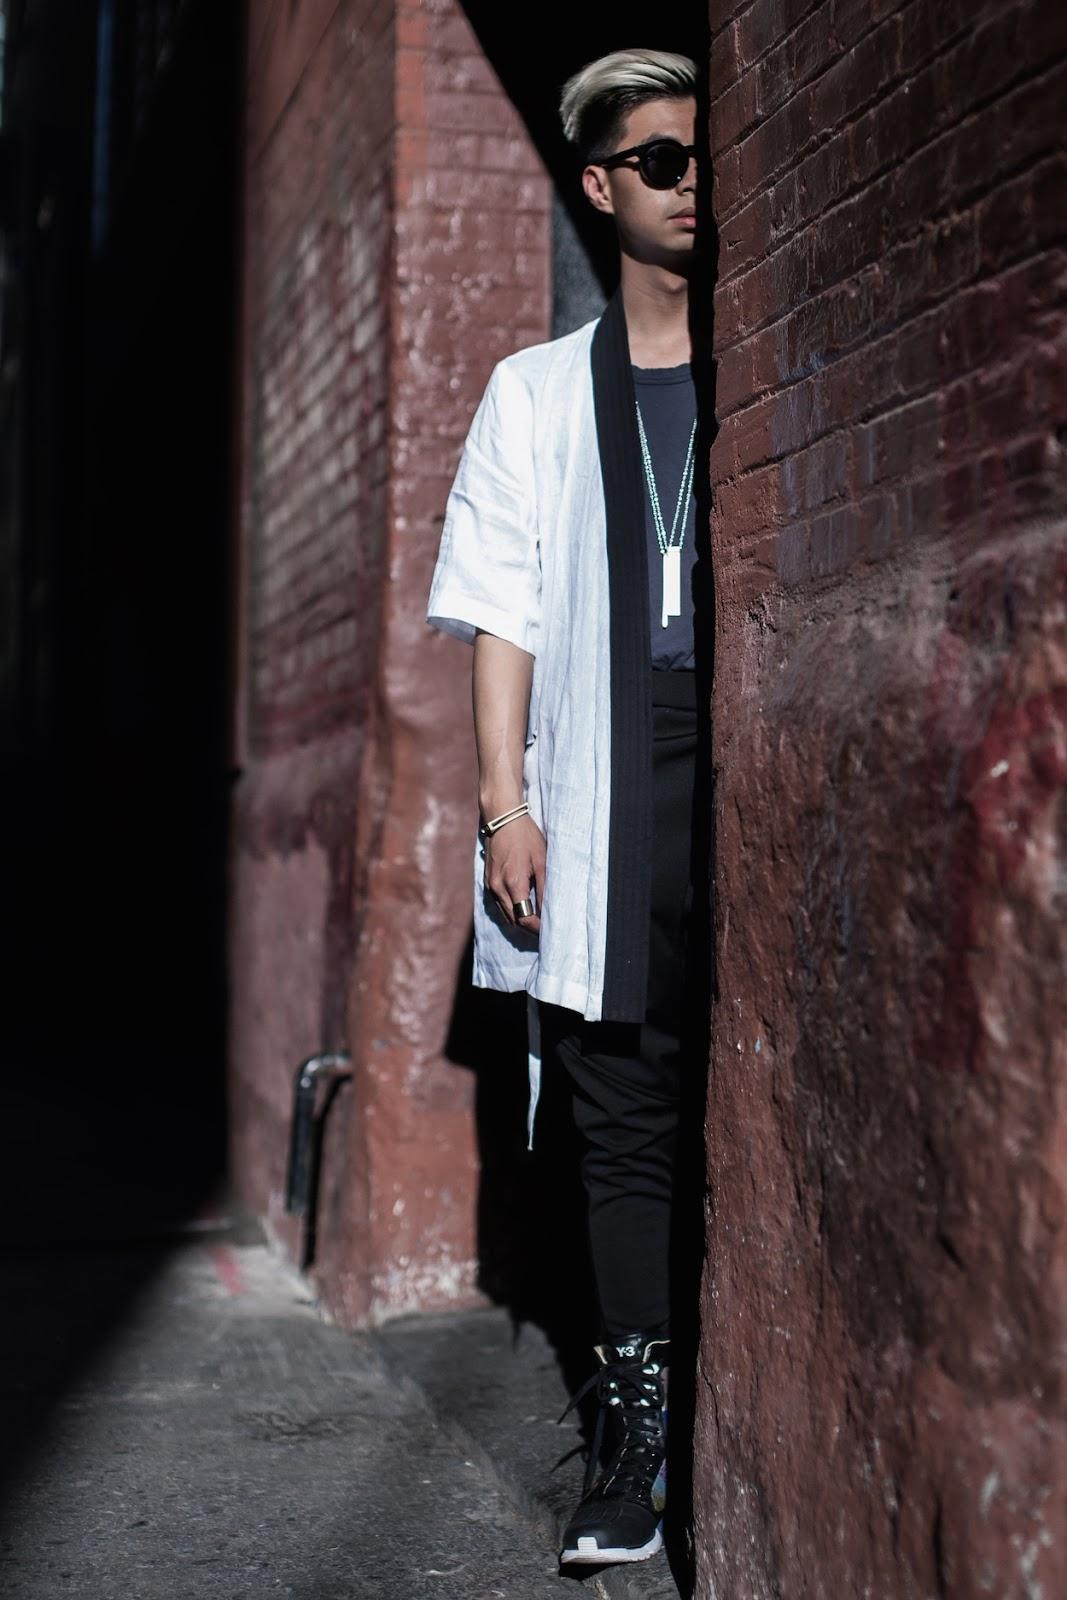 mybelonging-tommylei-menswearblogger-lura-brand-eyewear-3paradis-2.jpg